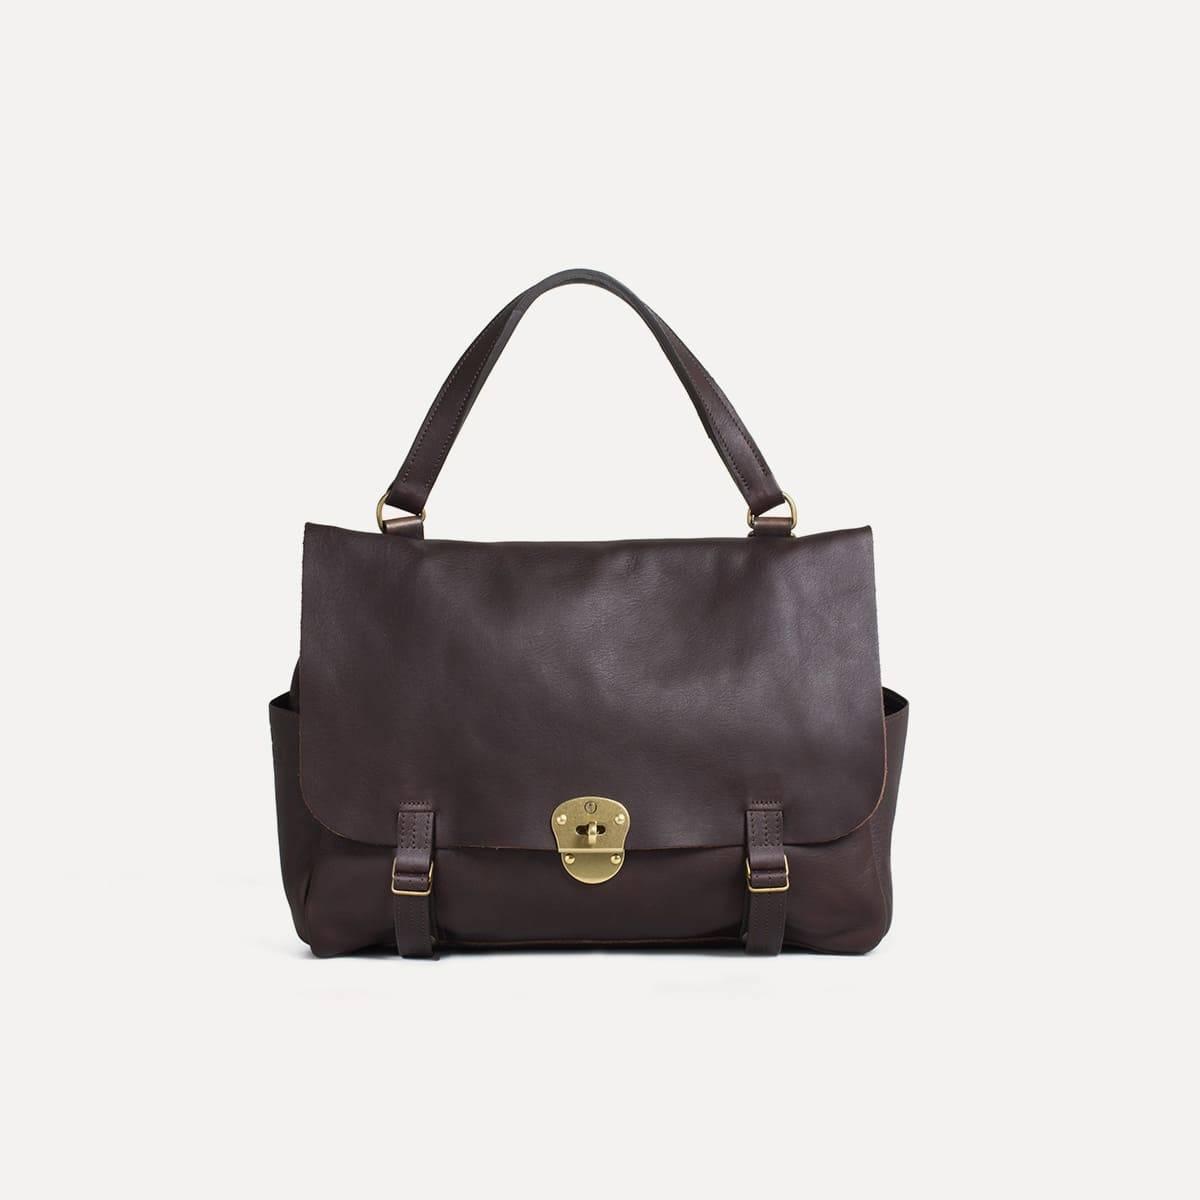 Coline bag M - Peat (image n°1)